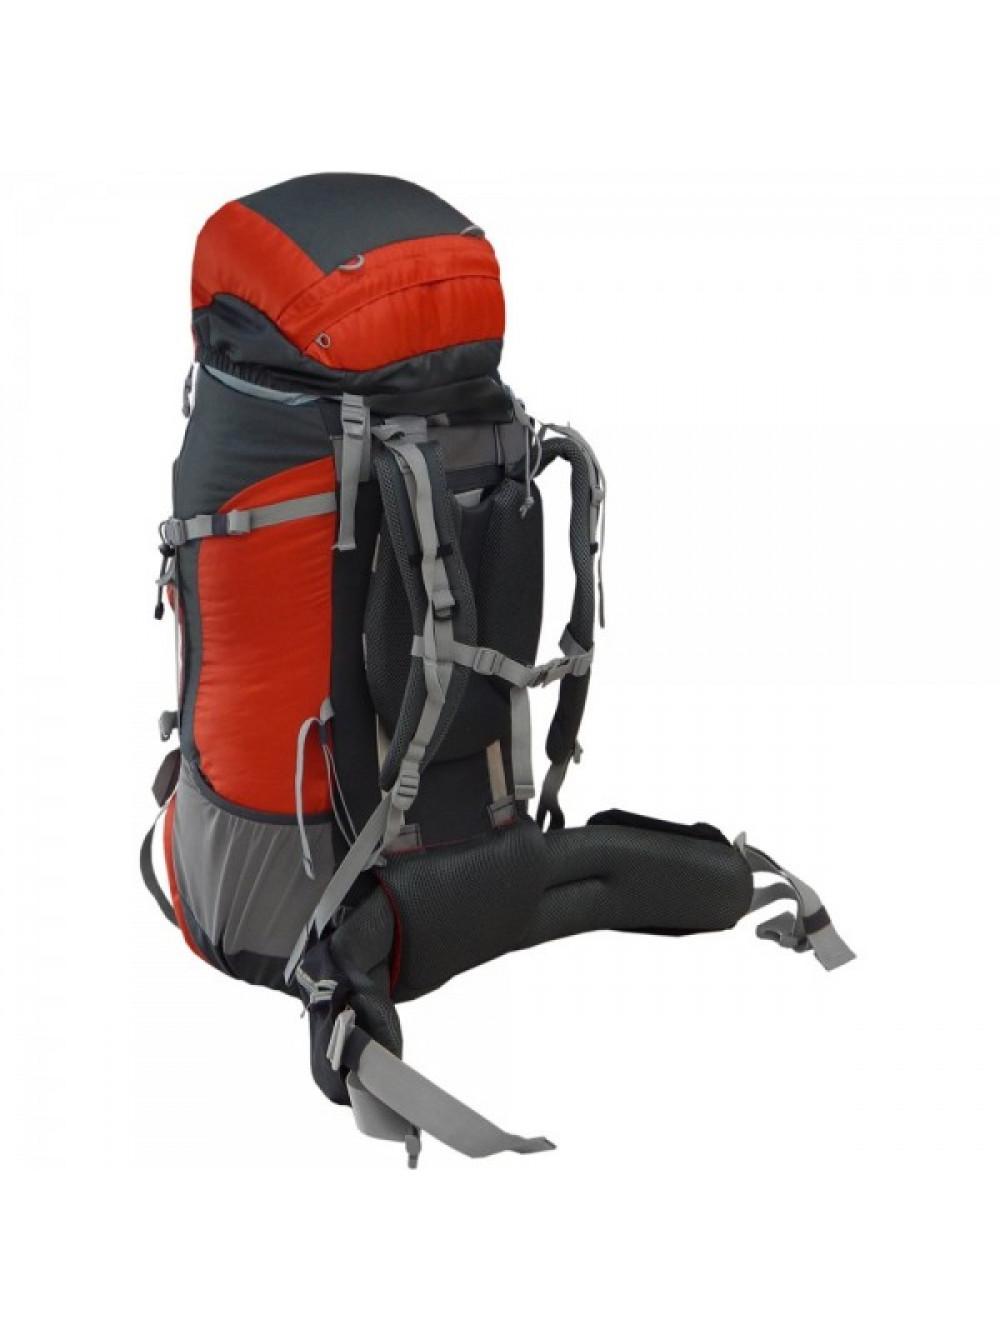 Рюкзак гидра 85 nova tour отзывы скутер рюкзак